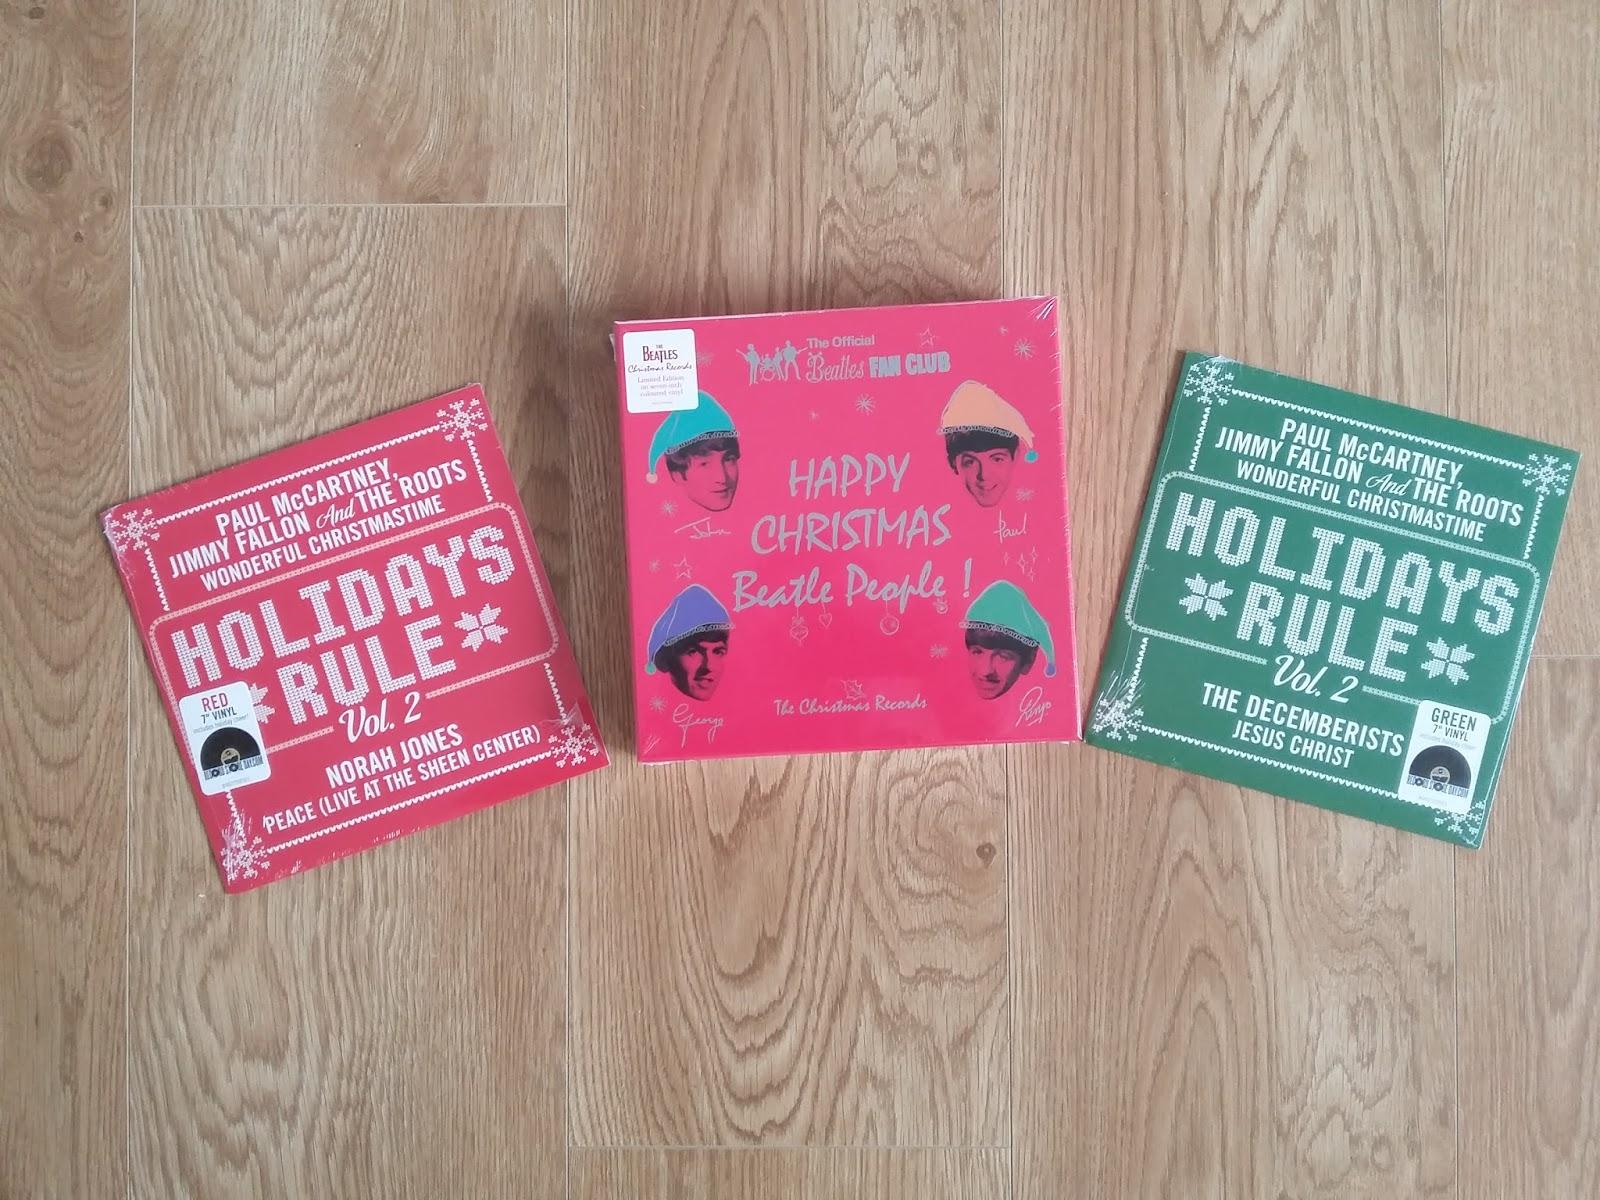 "Snowflakes Christmas Singles: A Paul McCartney Christmas on 7"" vinyl"